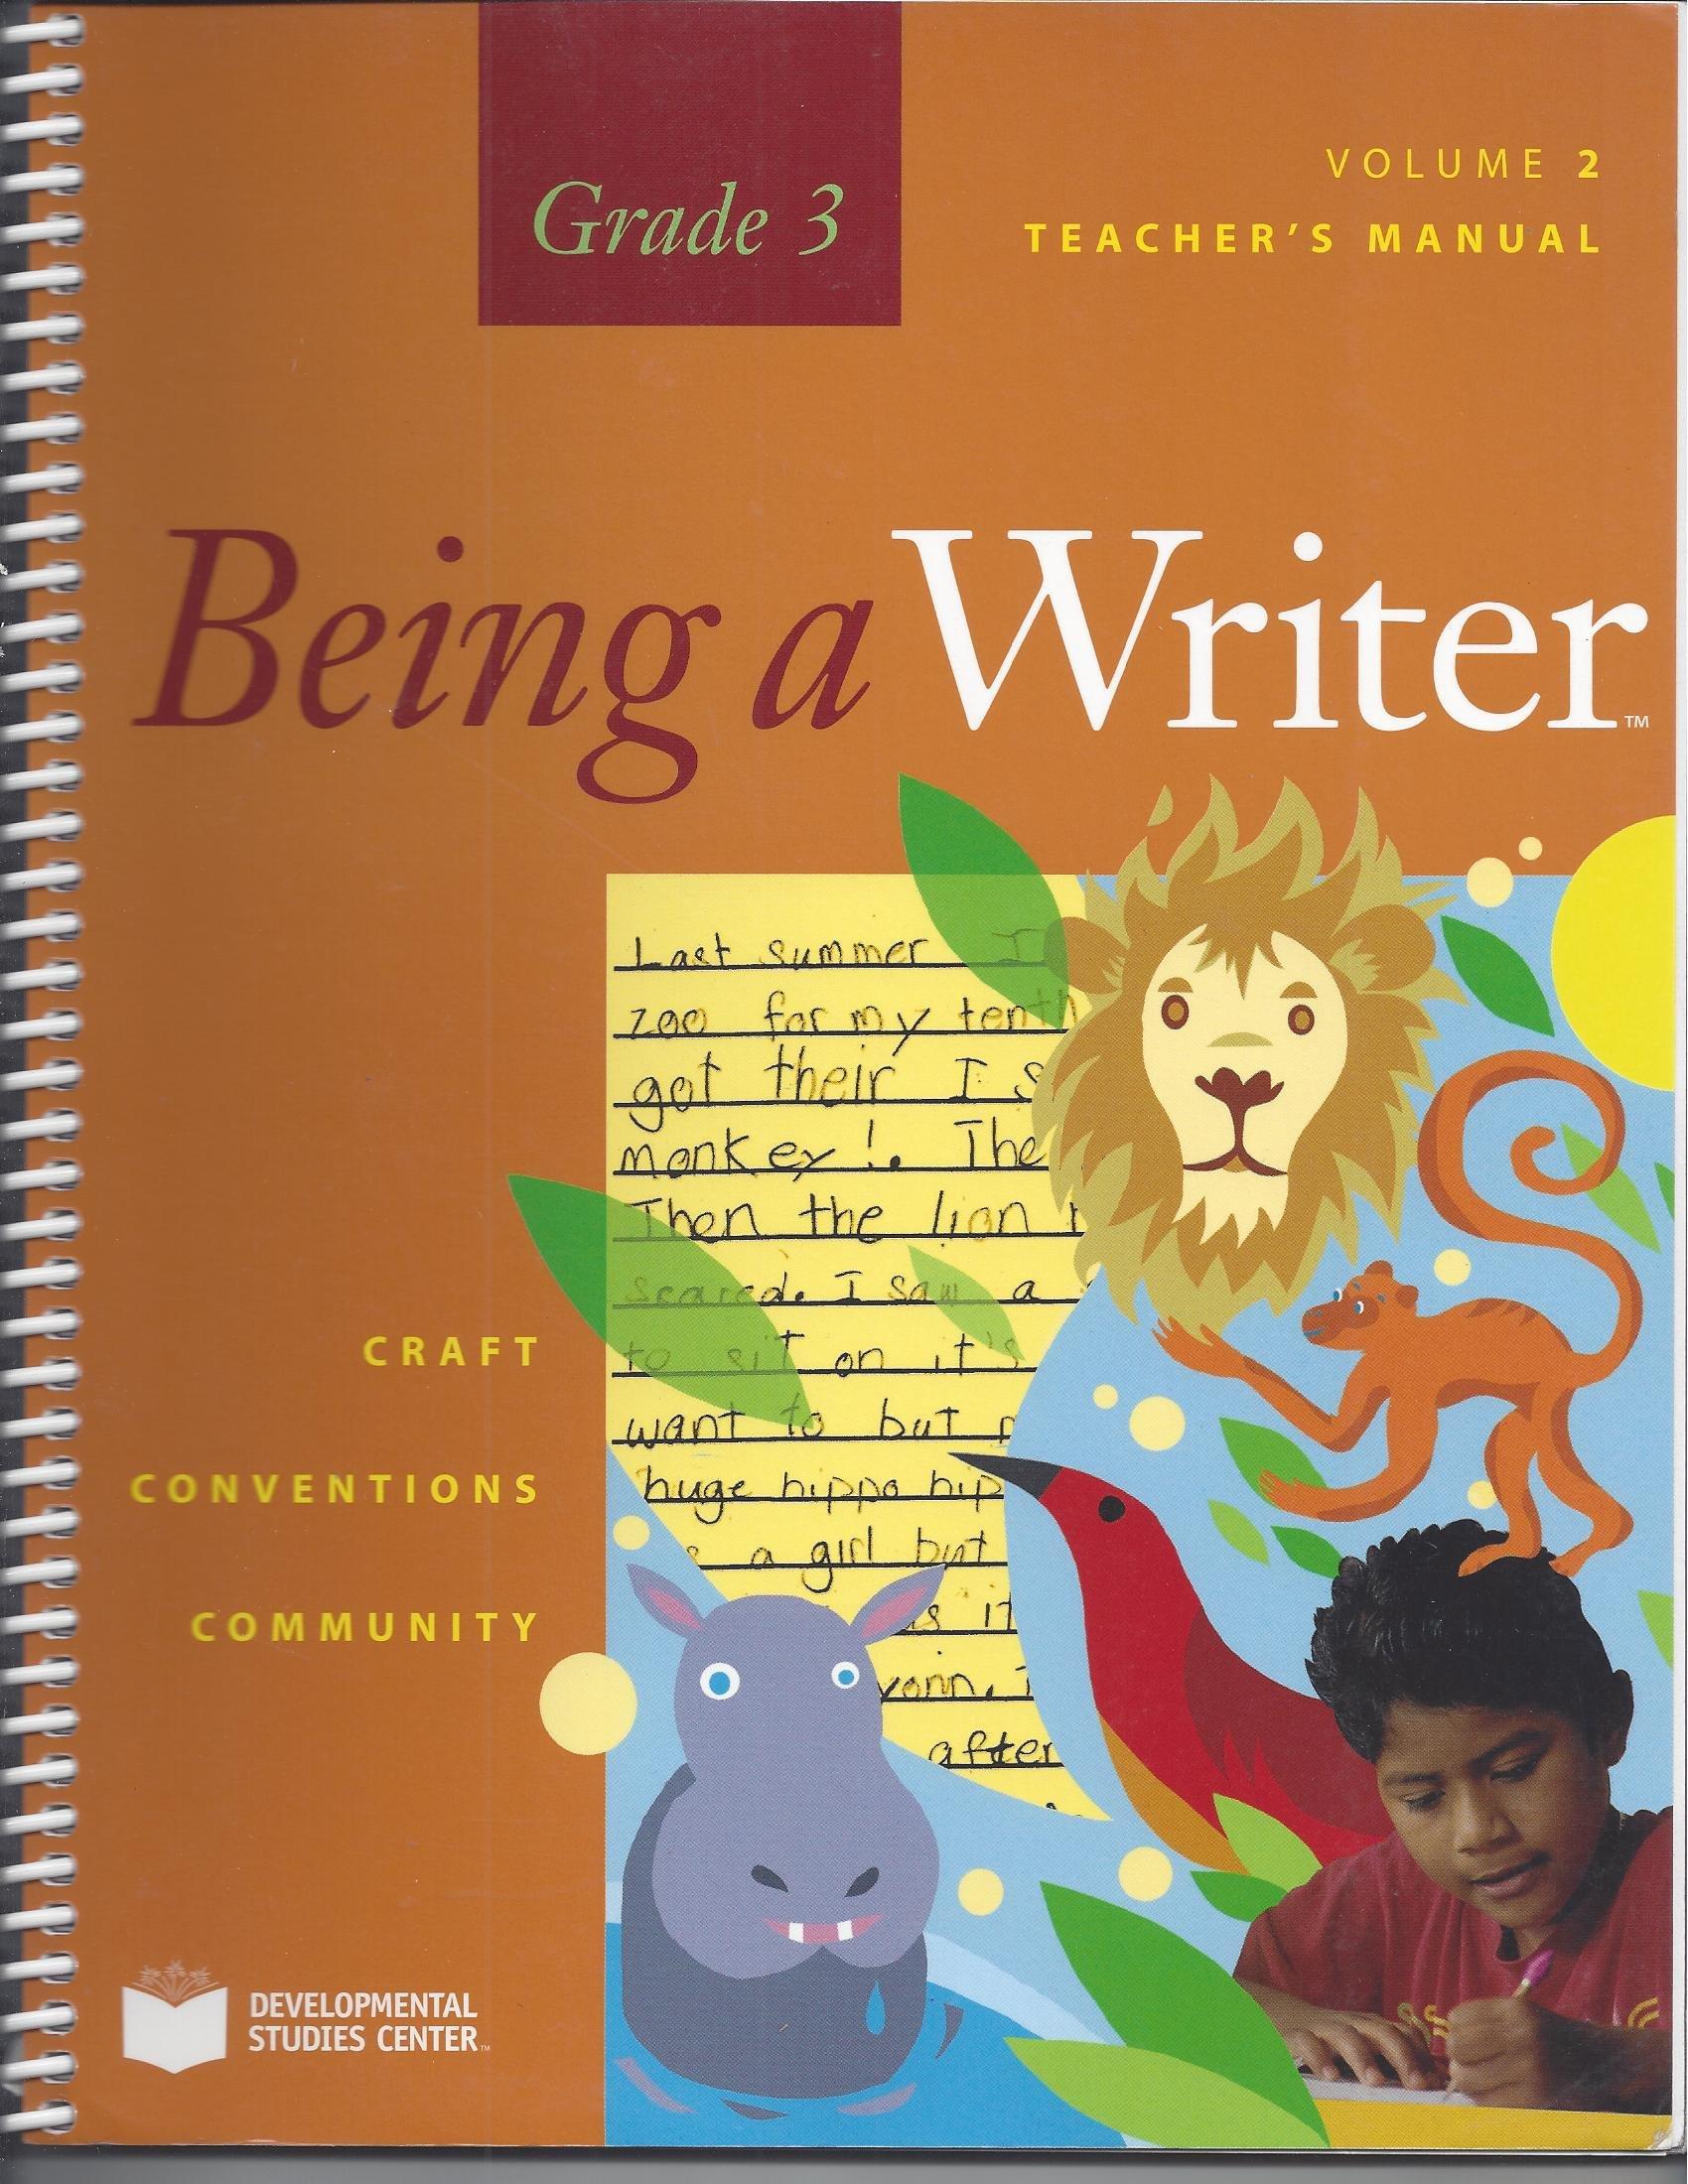 Teacher Manual Volume 2, Being a Writer, Grade 3 pdf epub